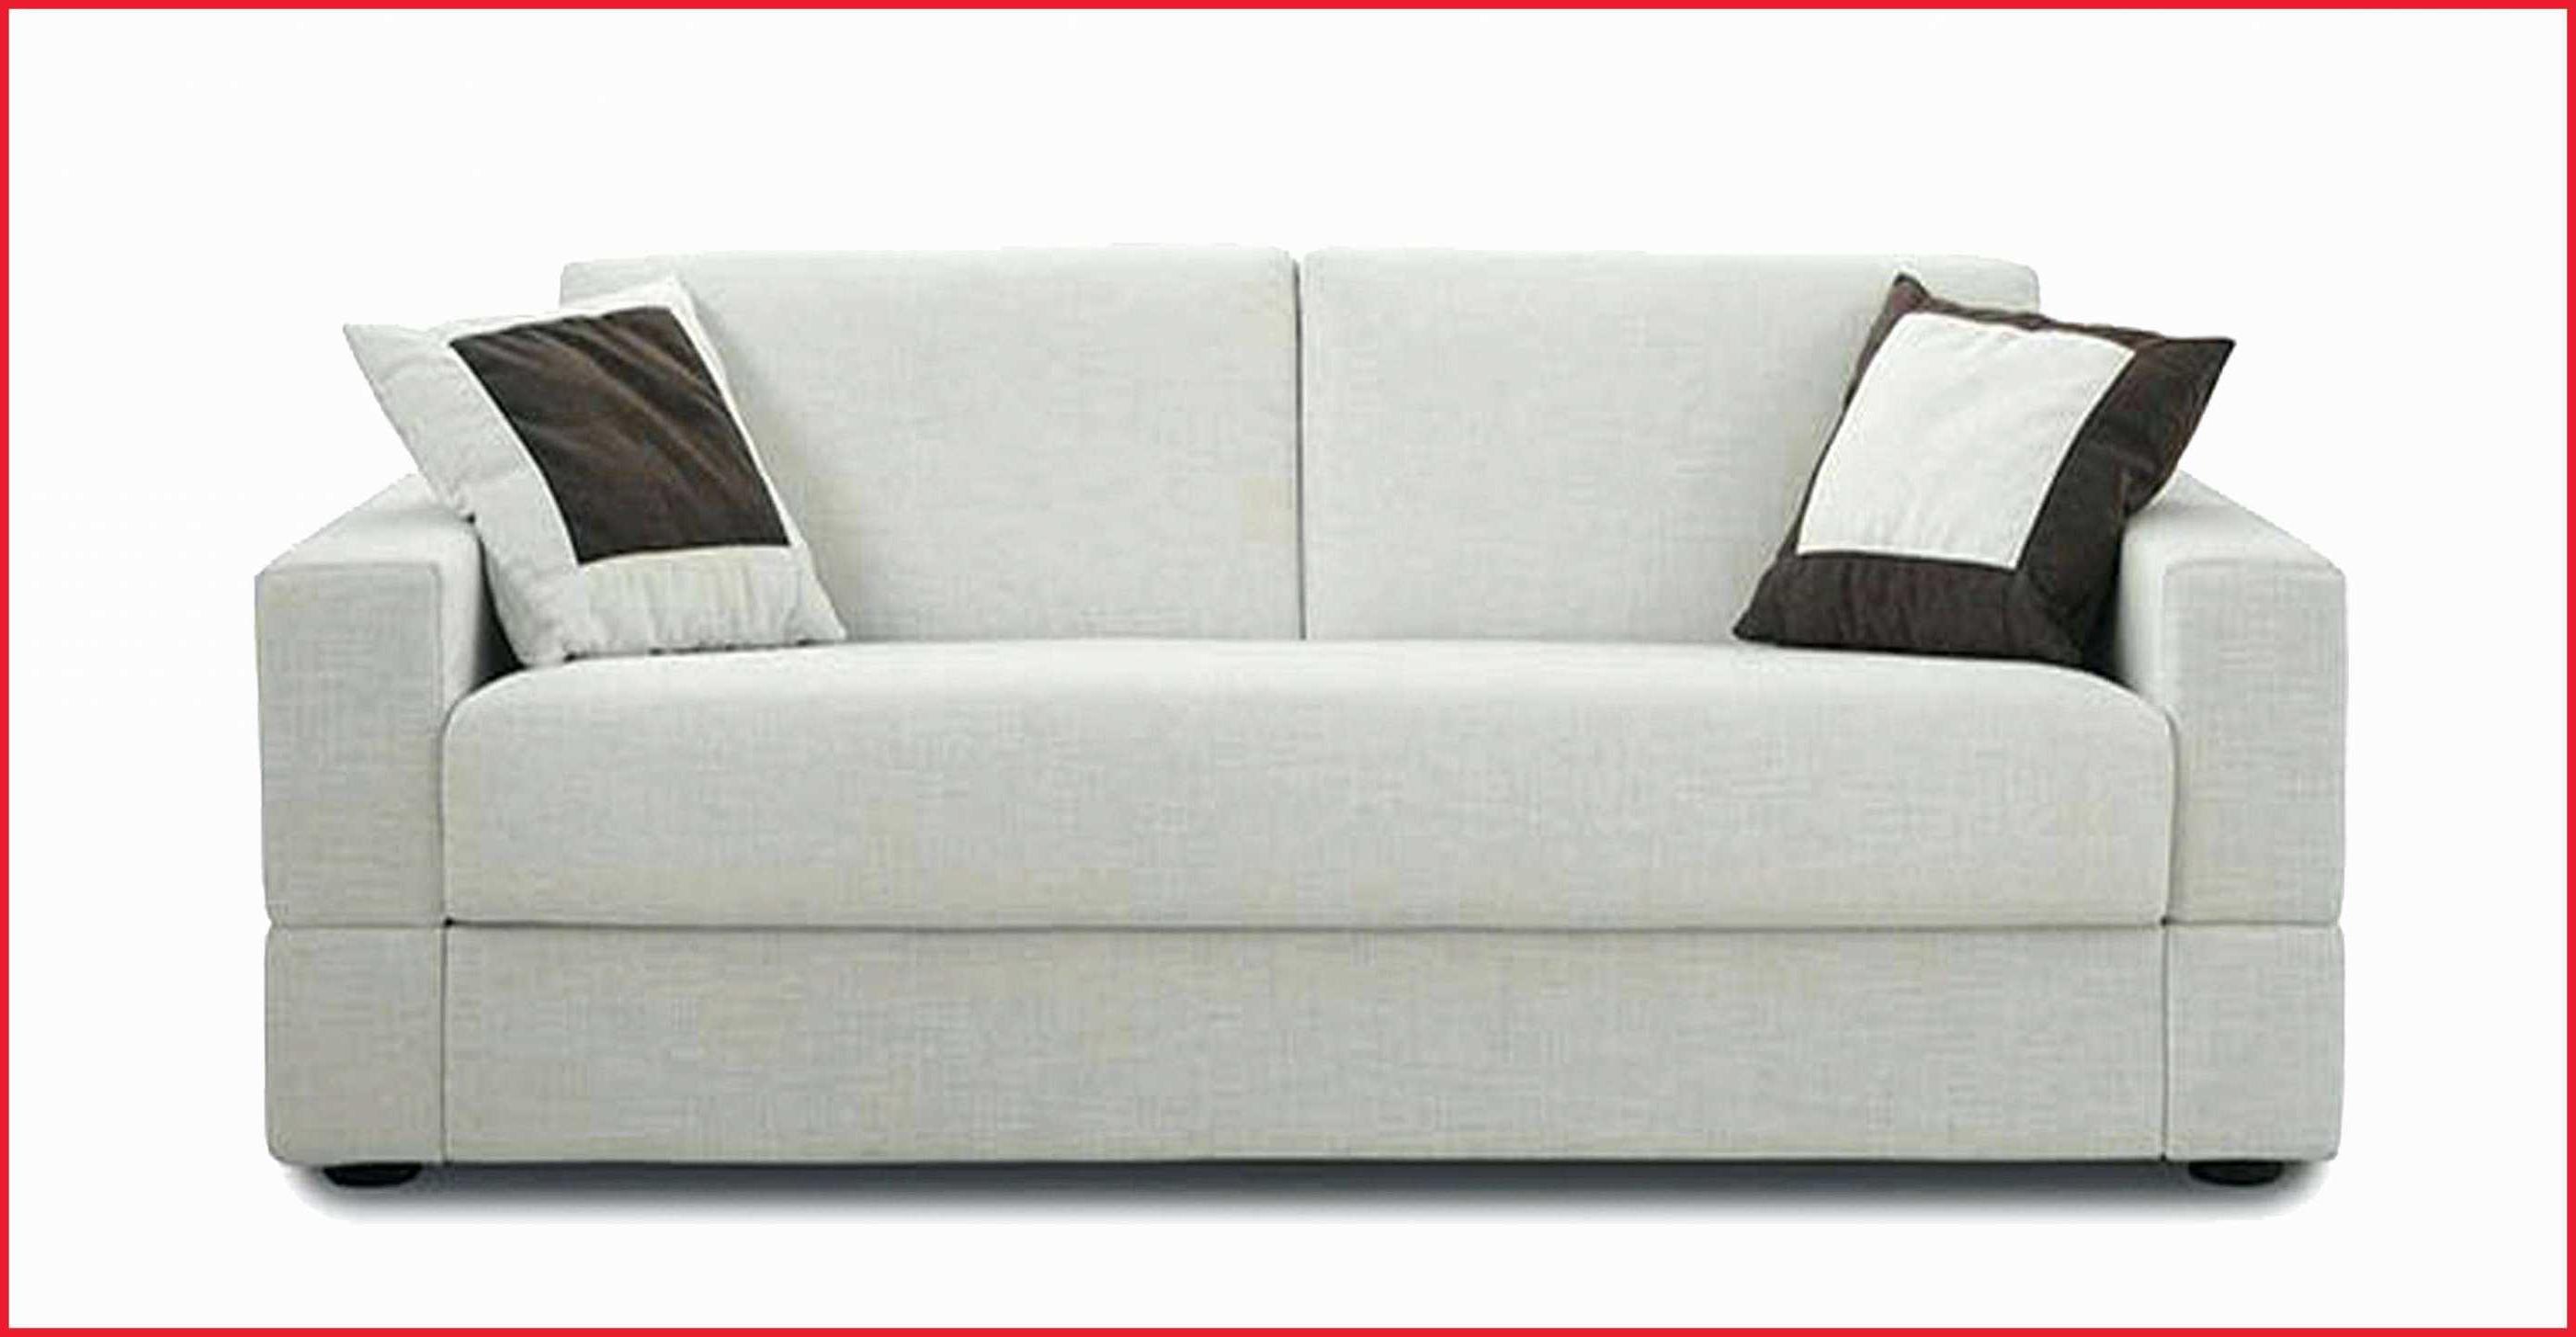 Sofa Cama Carrefour S1du sofa Cama Carrefour Beautiful sofas Cama Baratos En Carrefour Fresh